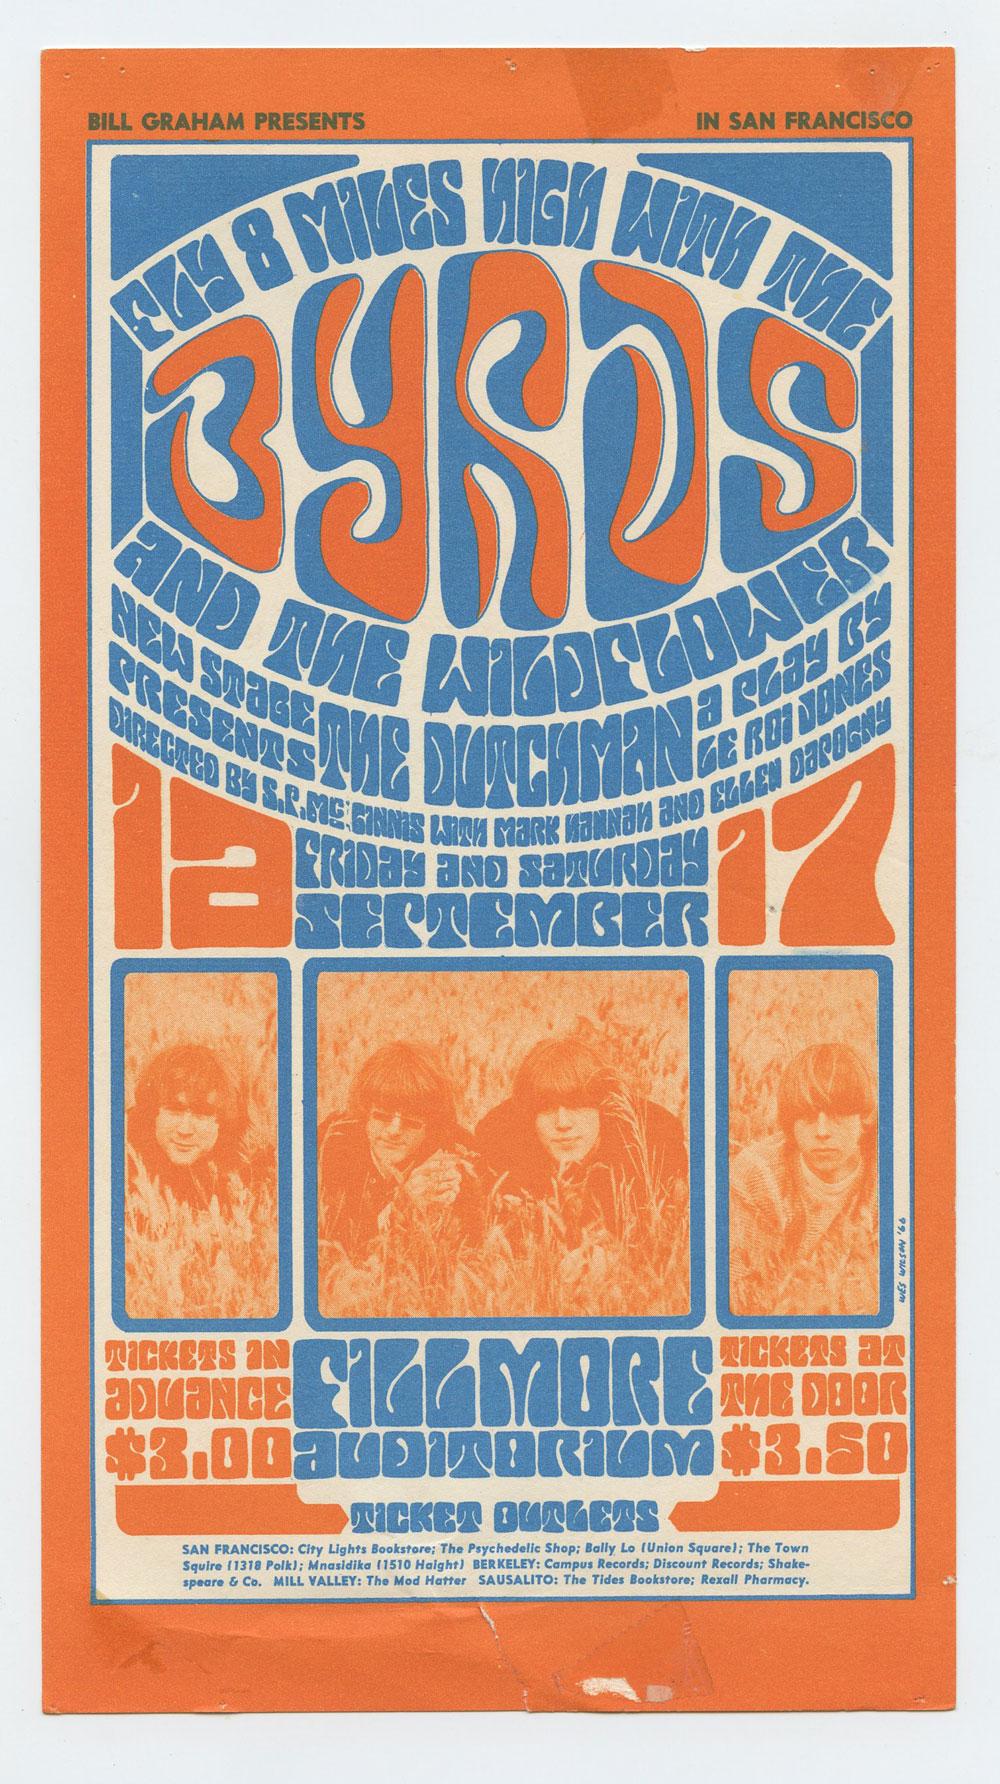 BG  28 Handbill The Byrds 1966 Sep 16 Very Fine